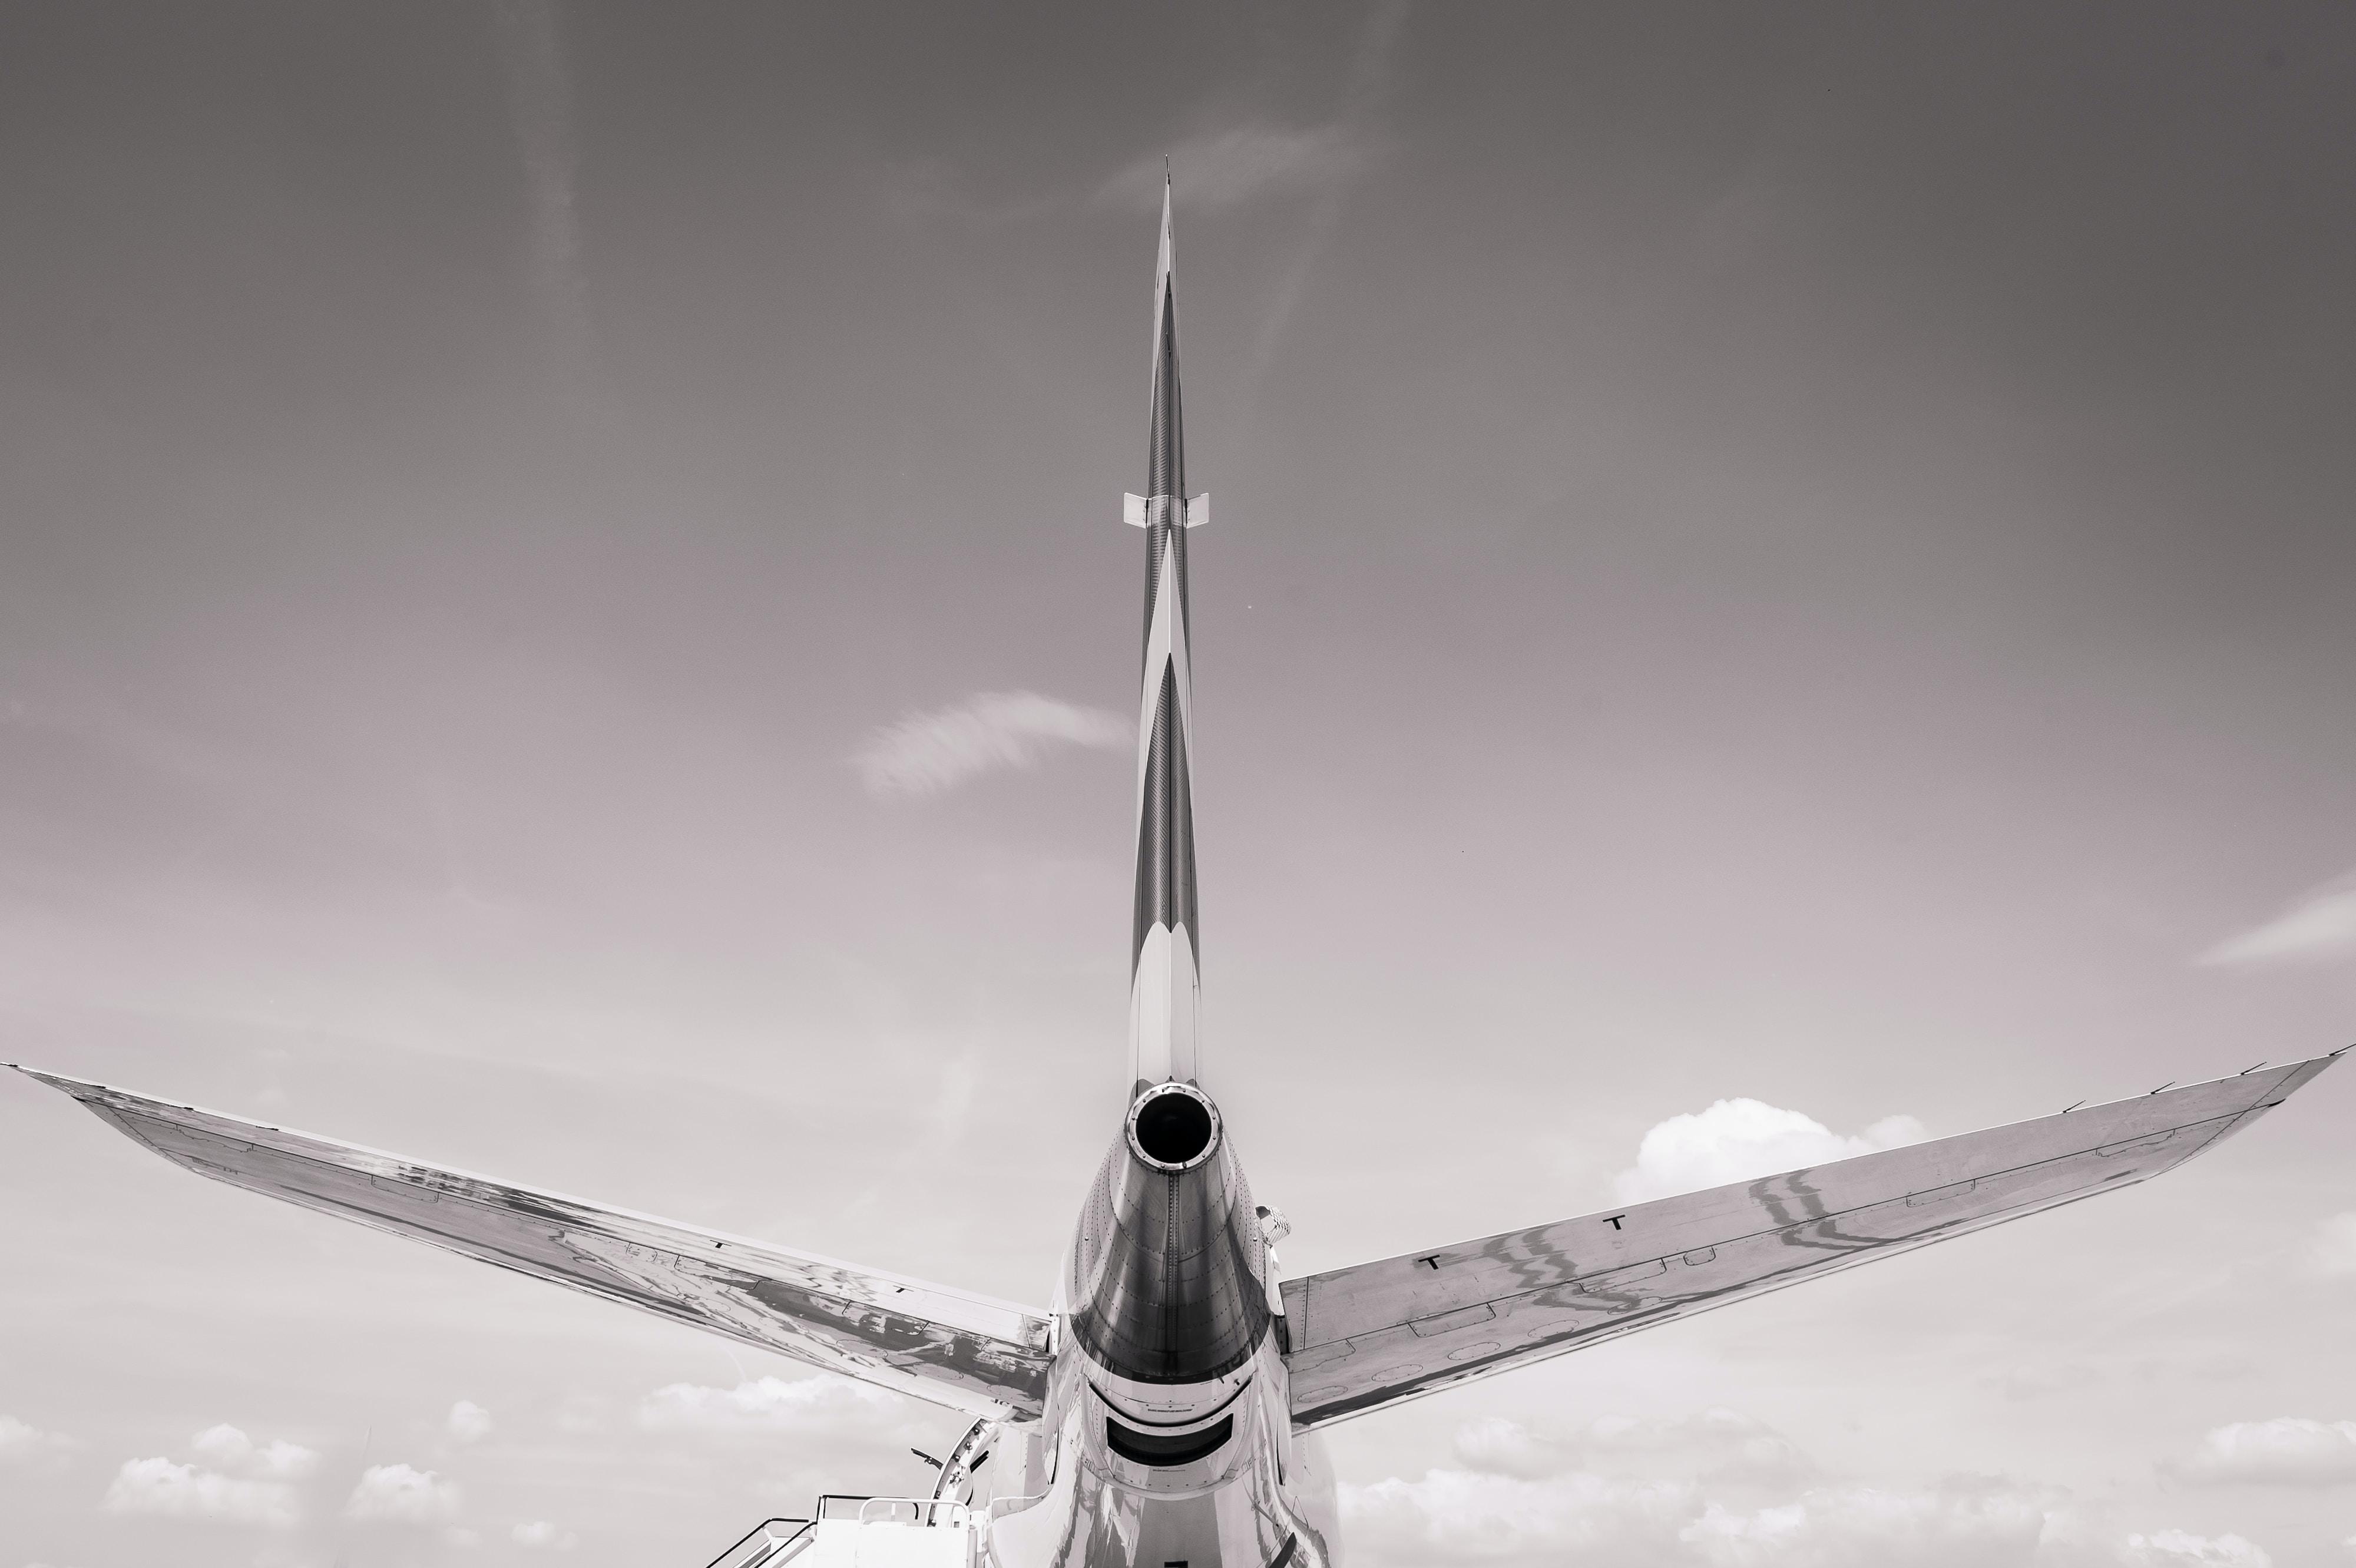 plane on flight